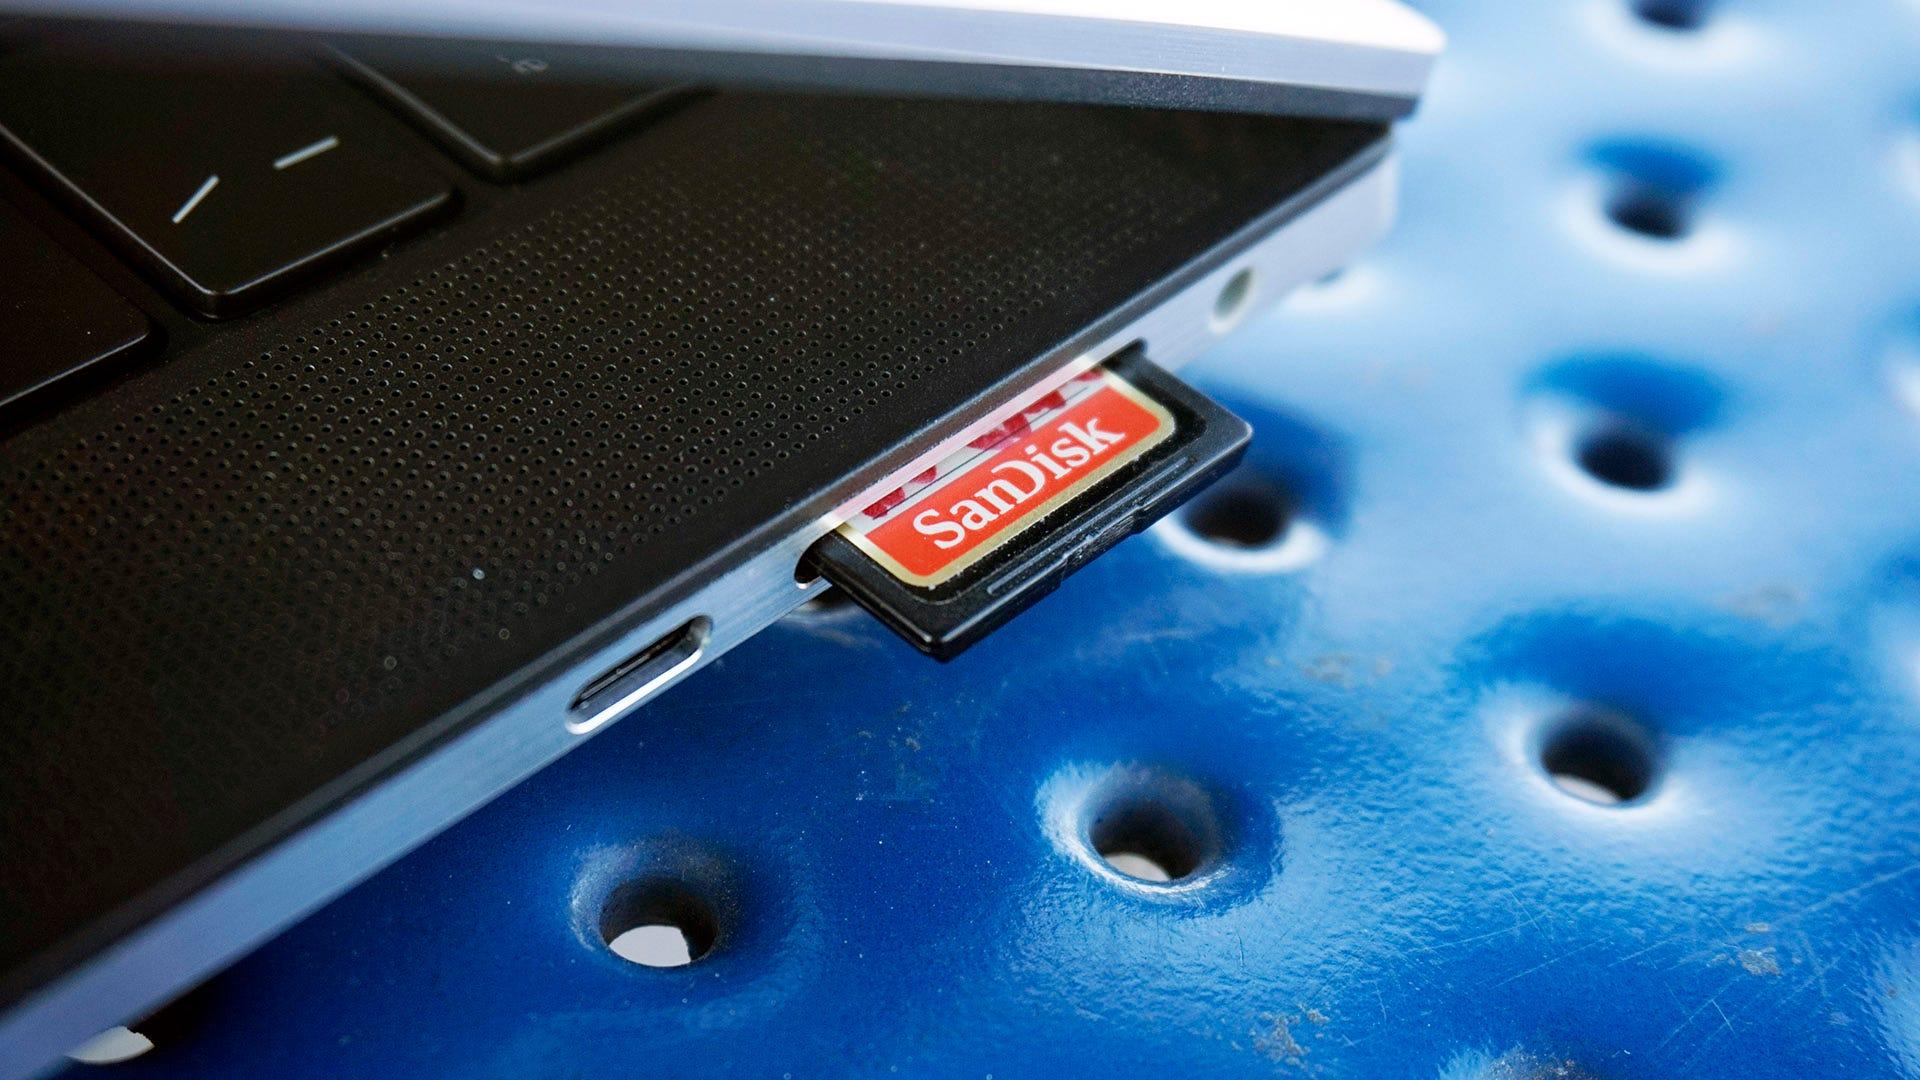 XPS 15 SD card slot